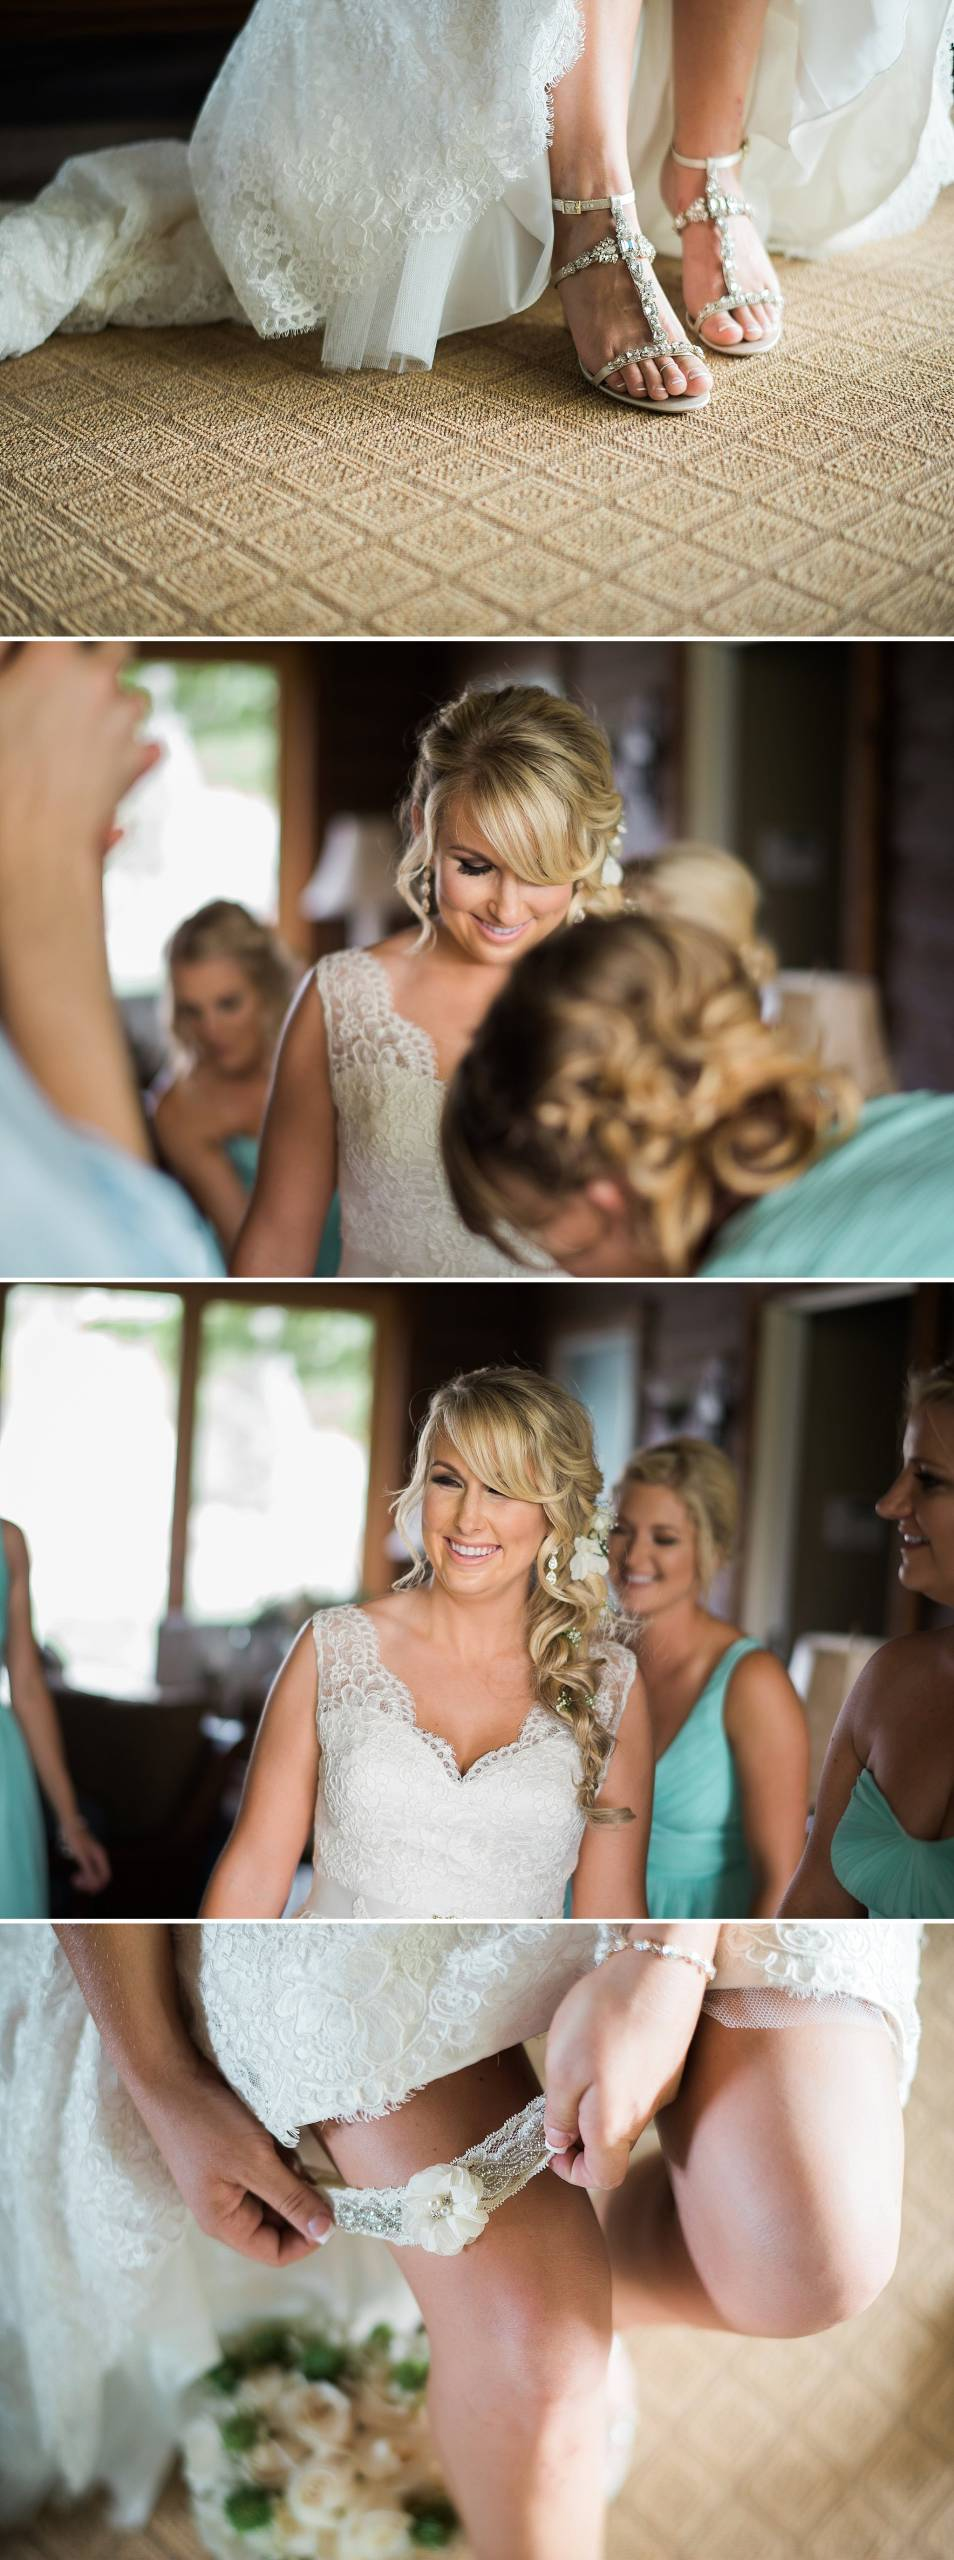 Erin + Marcel Third Element Photography & Cinema Fresno County Estate Wedding Hybrid Film Wedding Photographer_0012